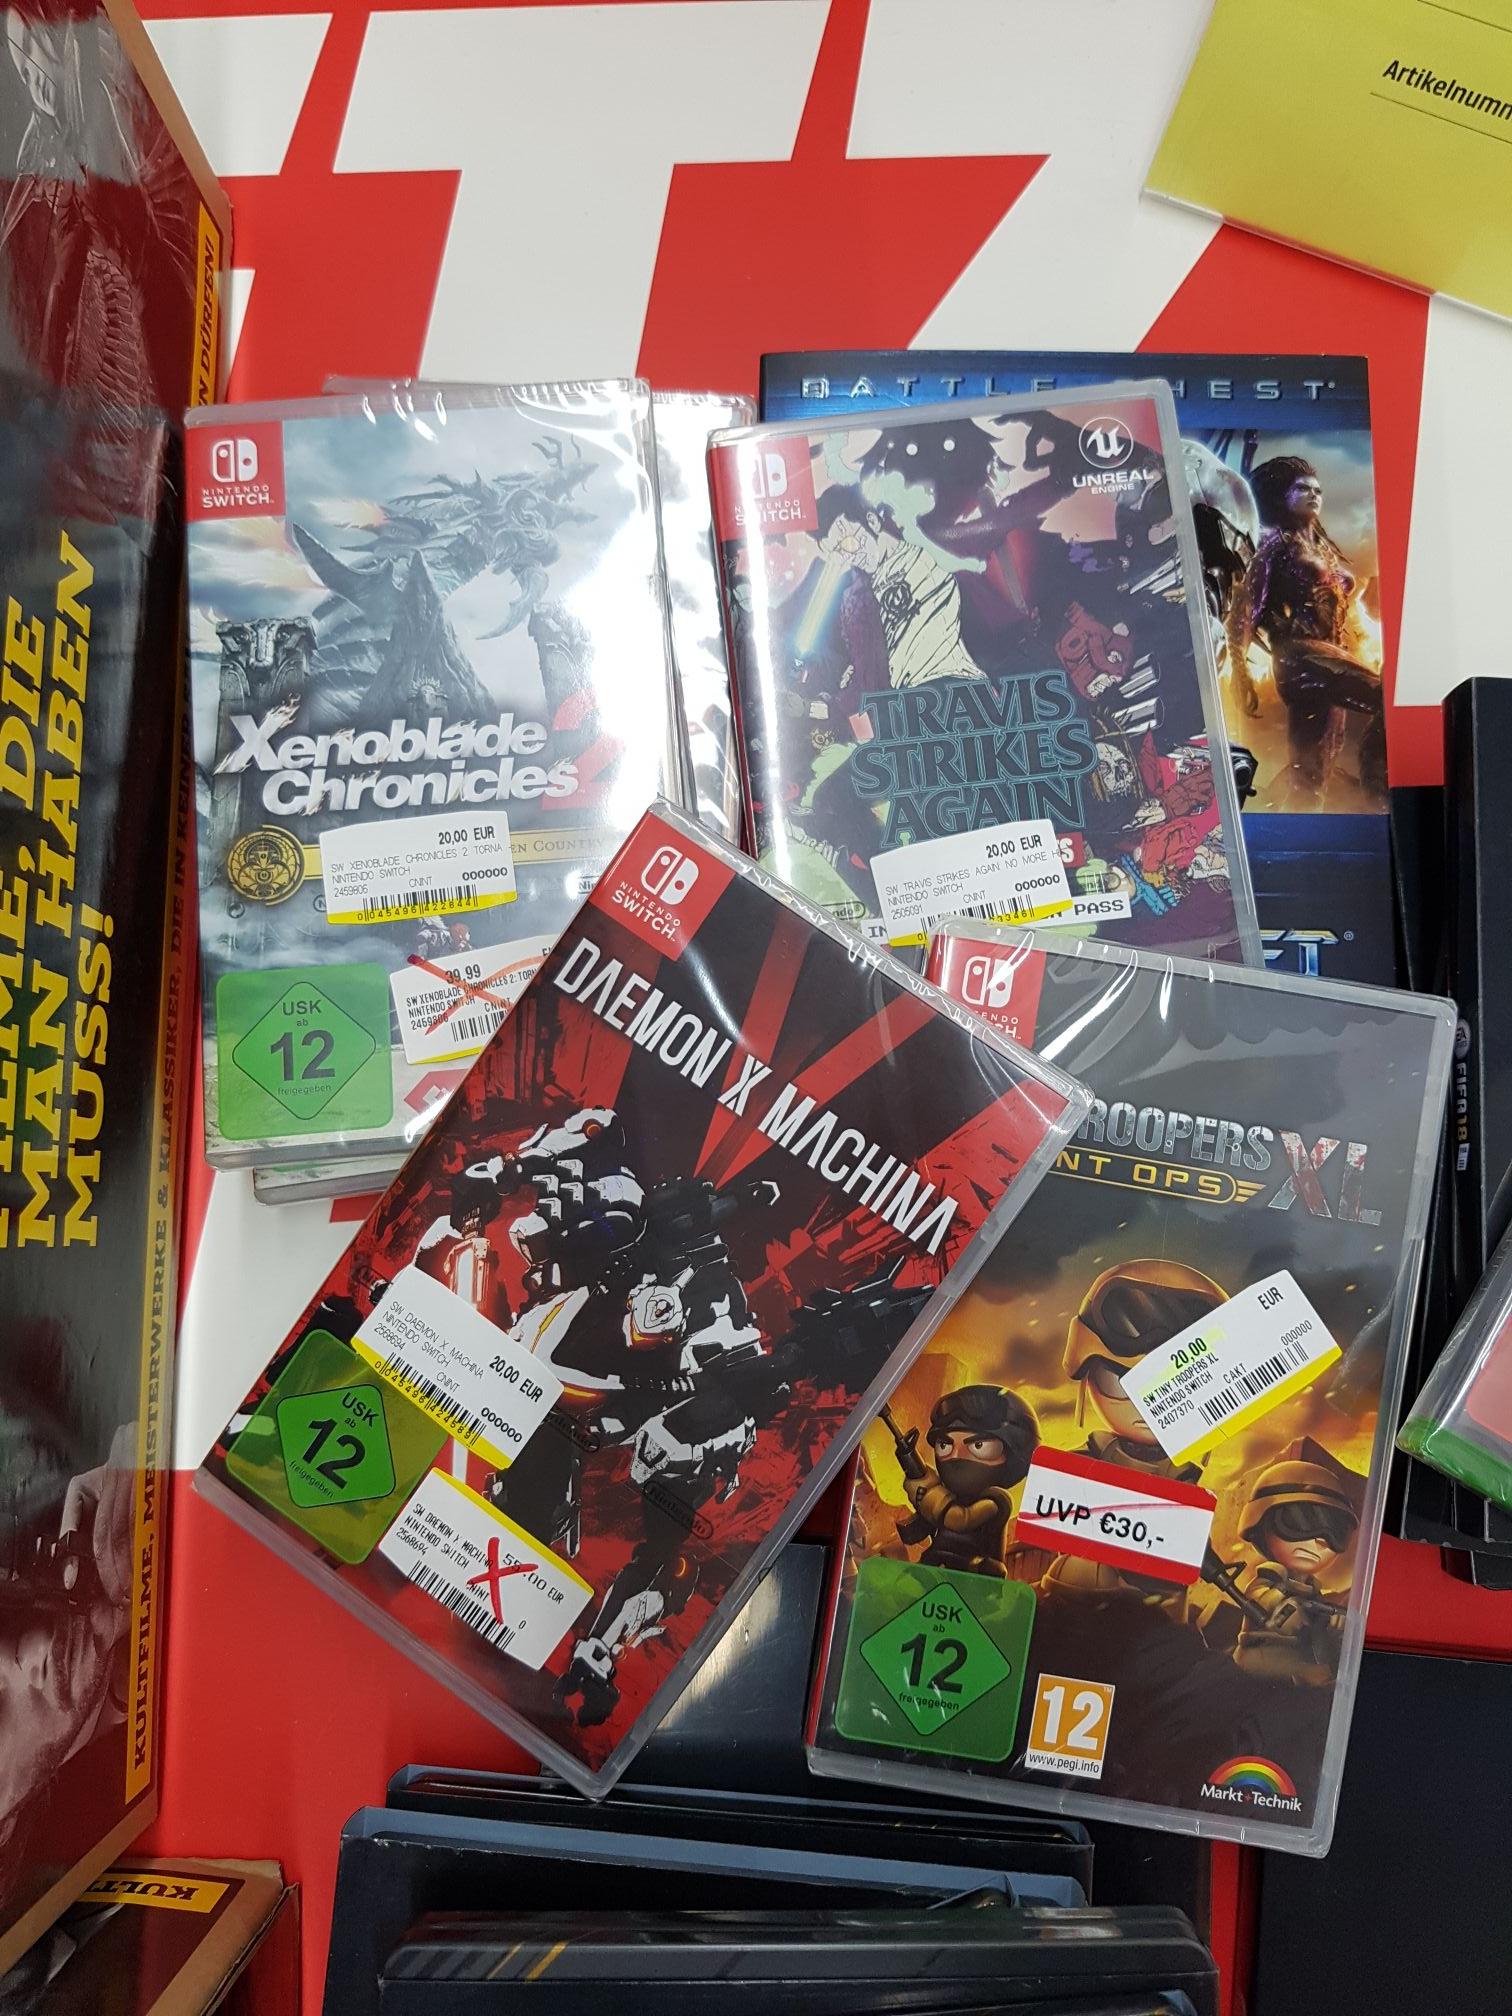 [Lokal Media Markt Marburg] Nintendo Switch Xenoblade Chronicles 2: Torna - The Golden Country für 20 Euro, PS4 Borderlands 3 für 5 Euro